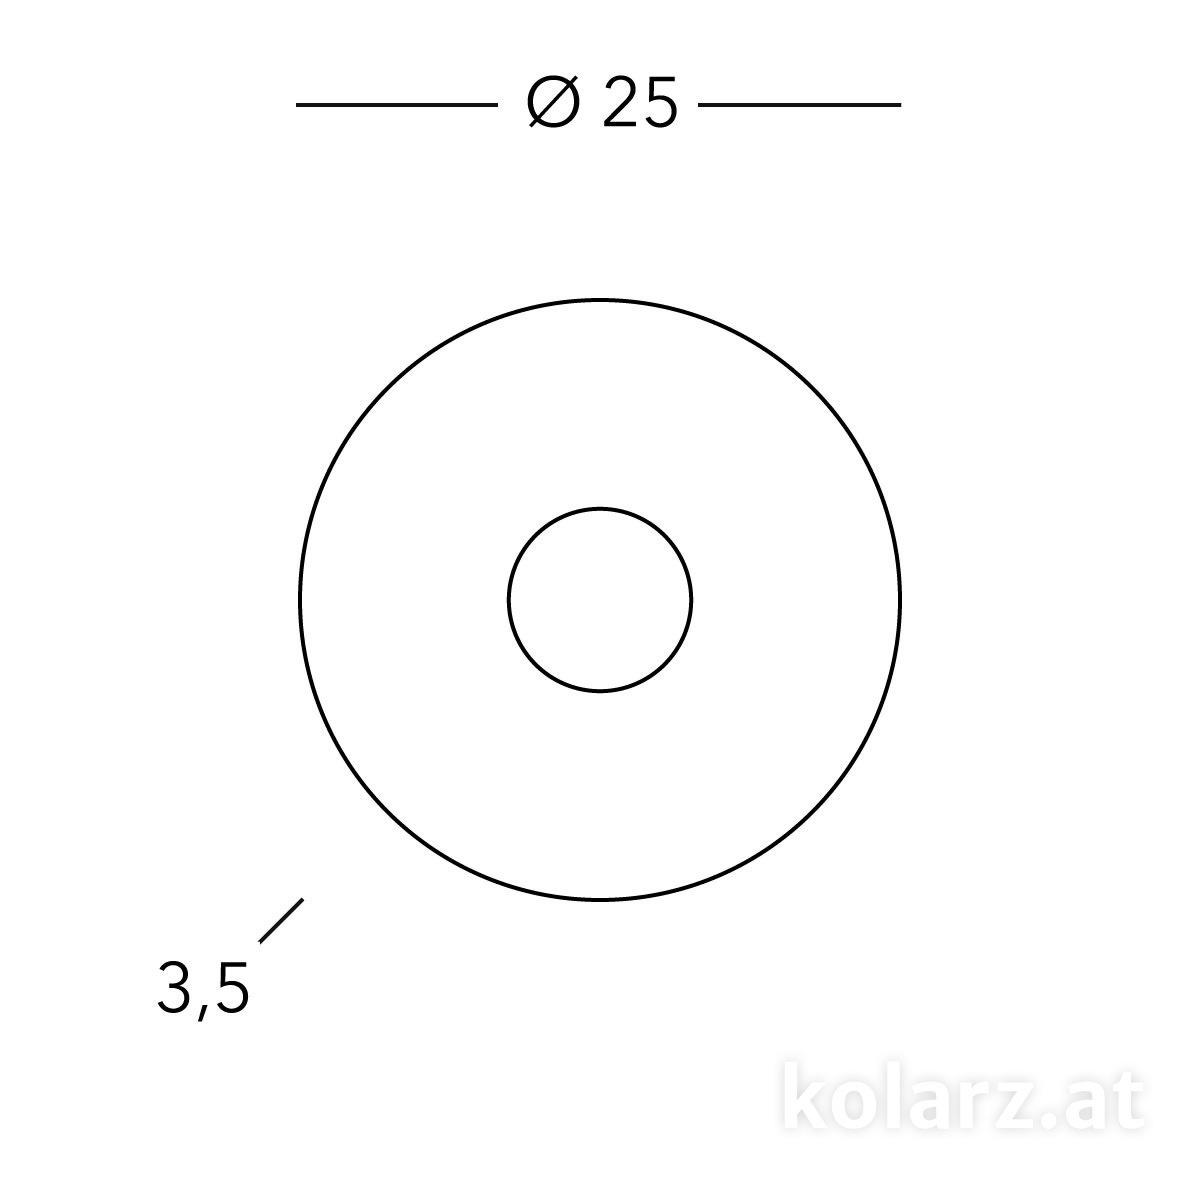 A1336-11-1-Au-s1.jpg